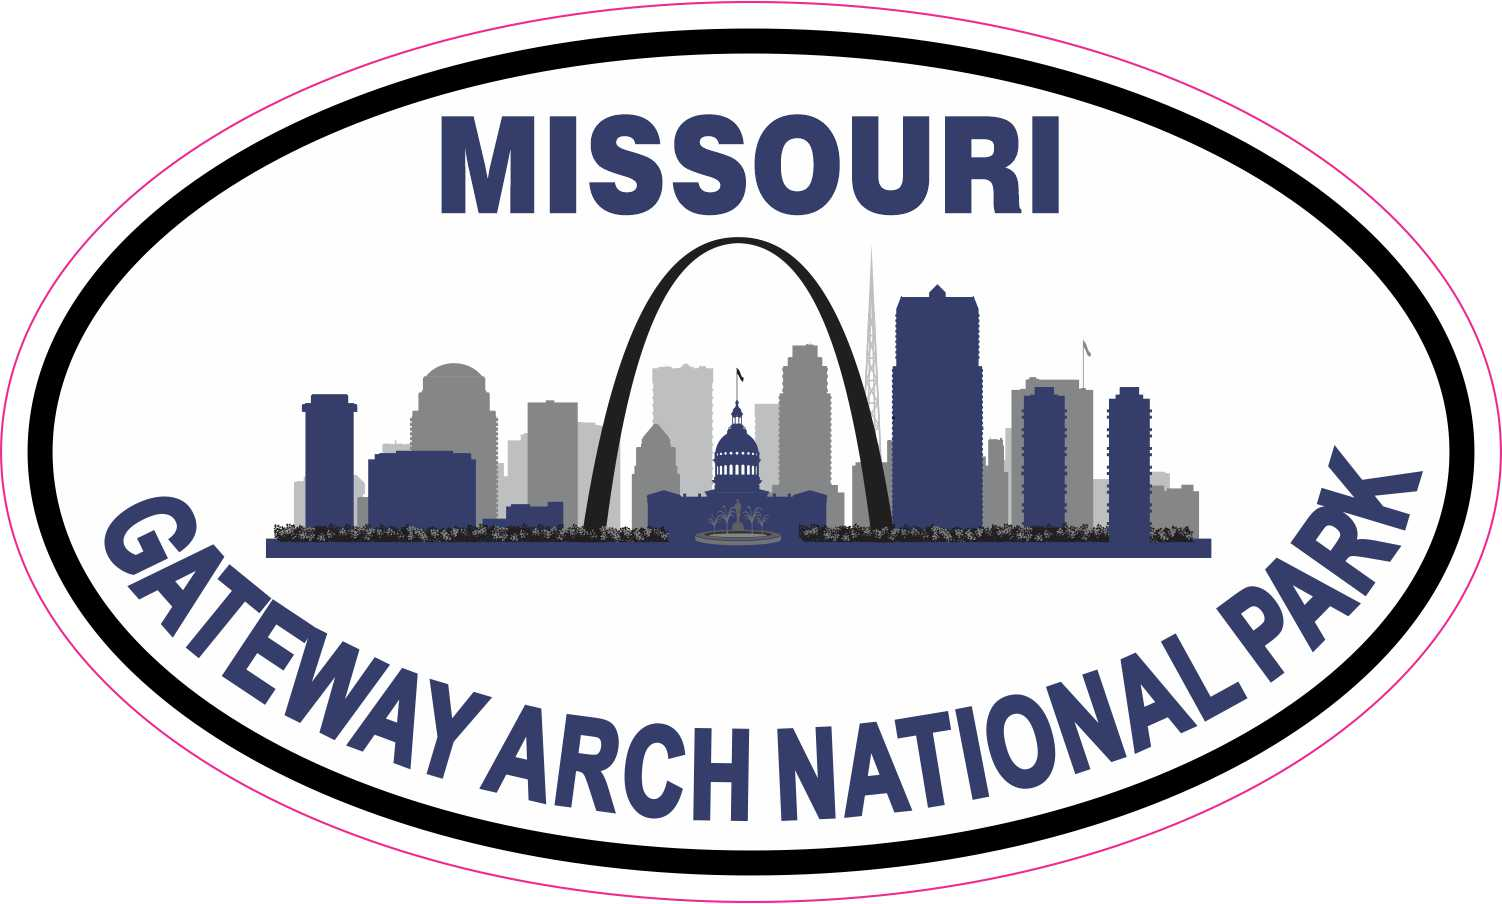 Gateway Arch National Park Sticker Decal R7115 Missouri YOU CHOOSE SIZE